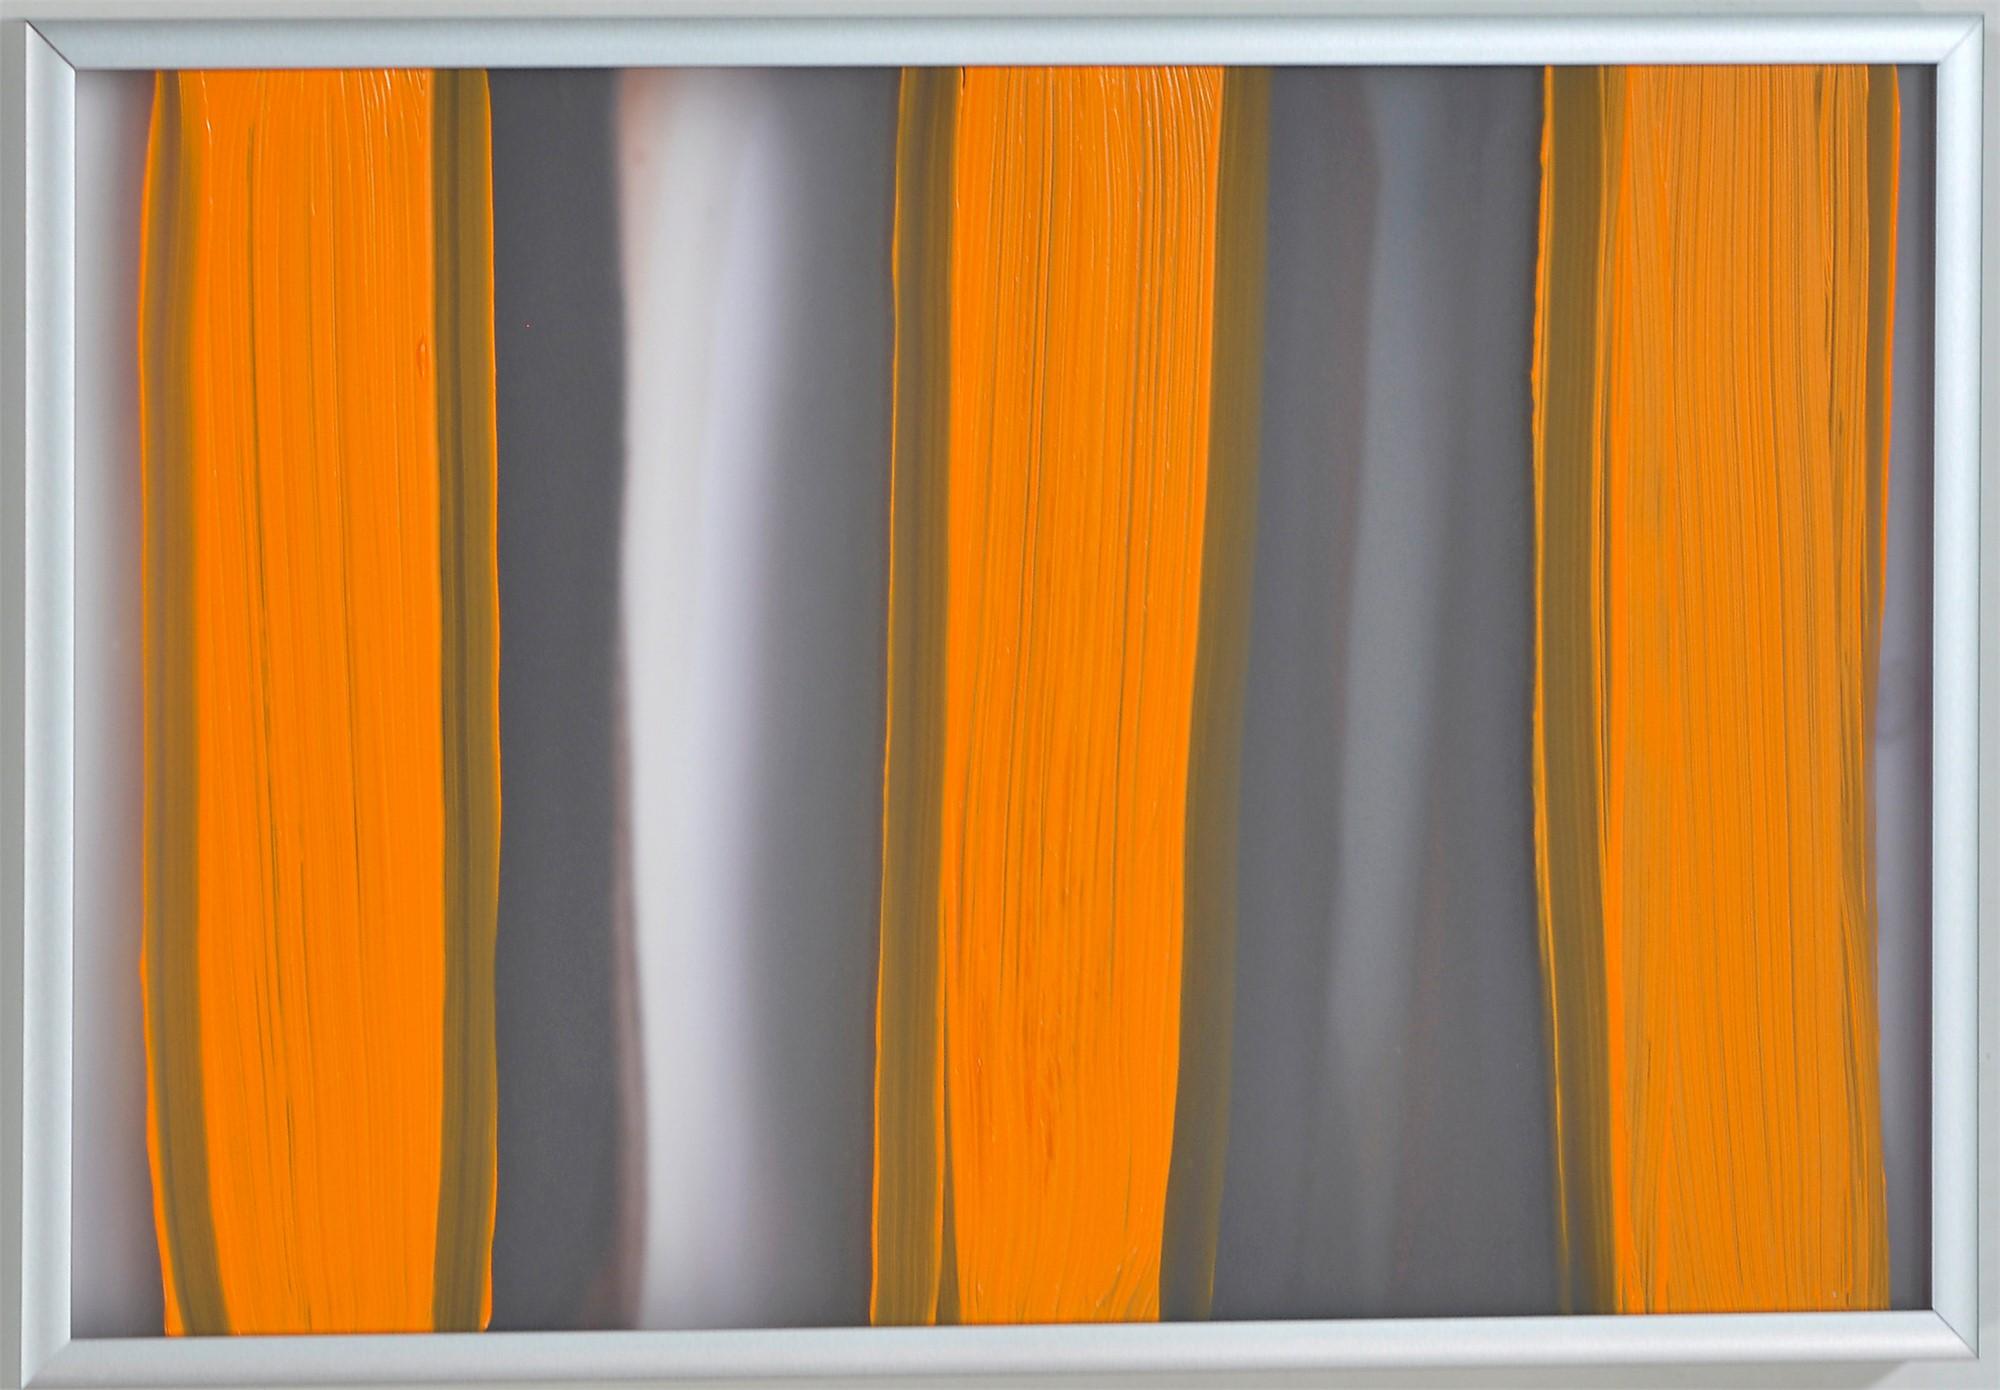 Sensing Lines 5 by Lucinda Cobley